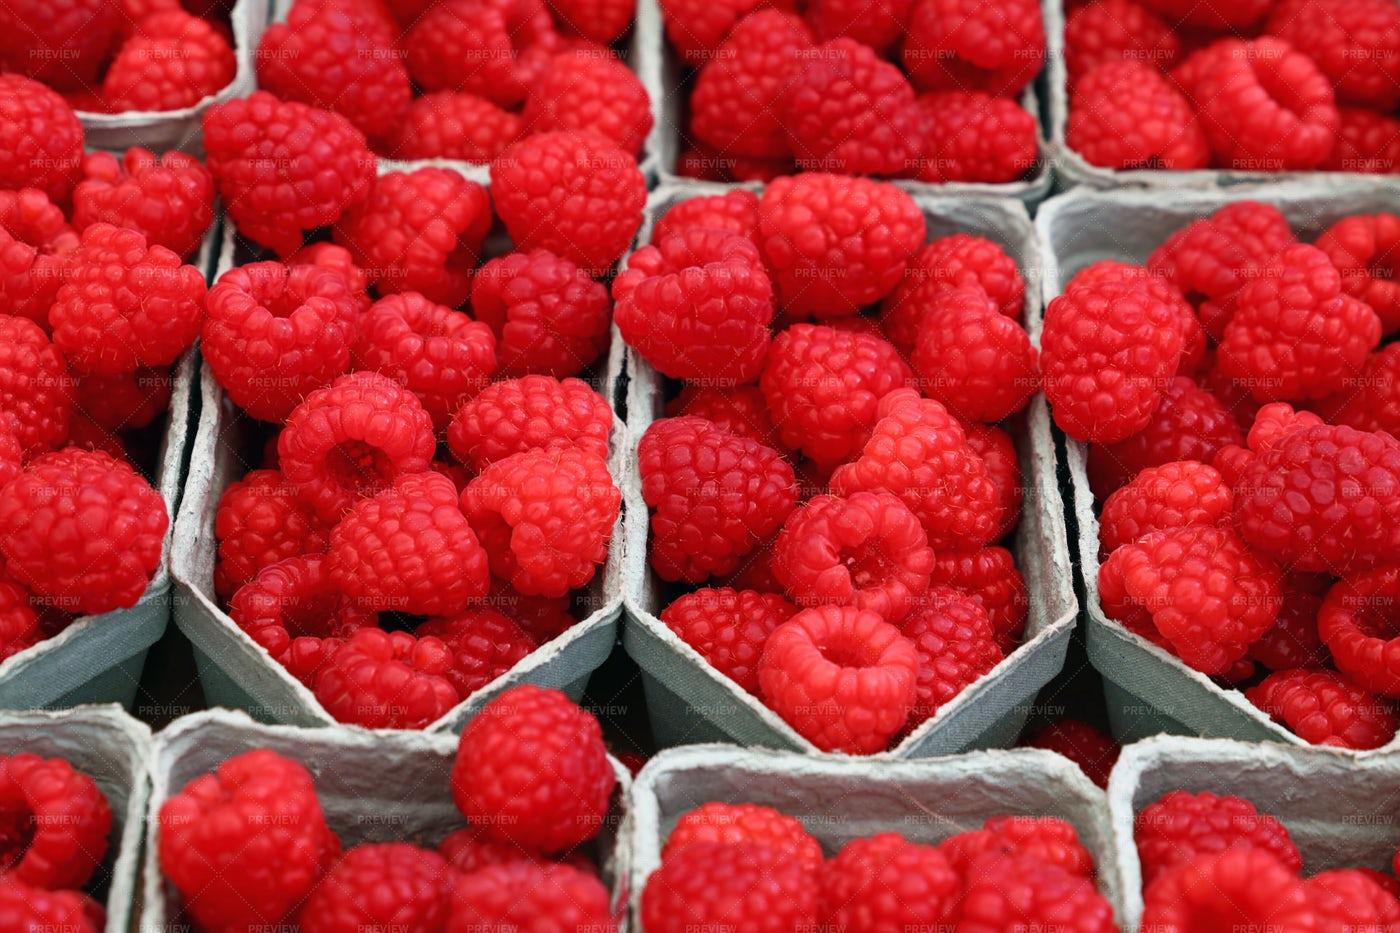 Raspberries For Sale: Stock Photos